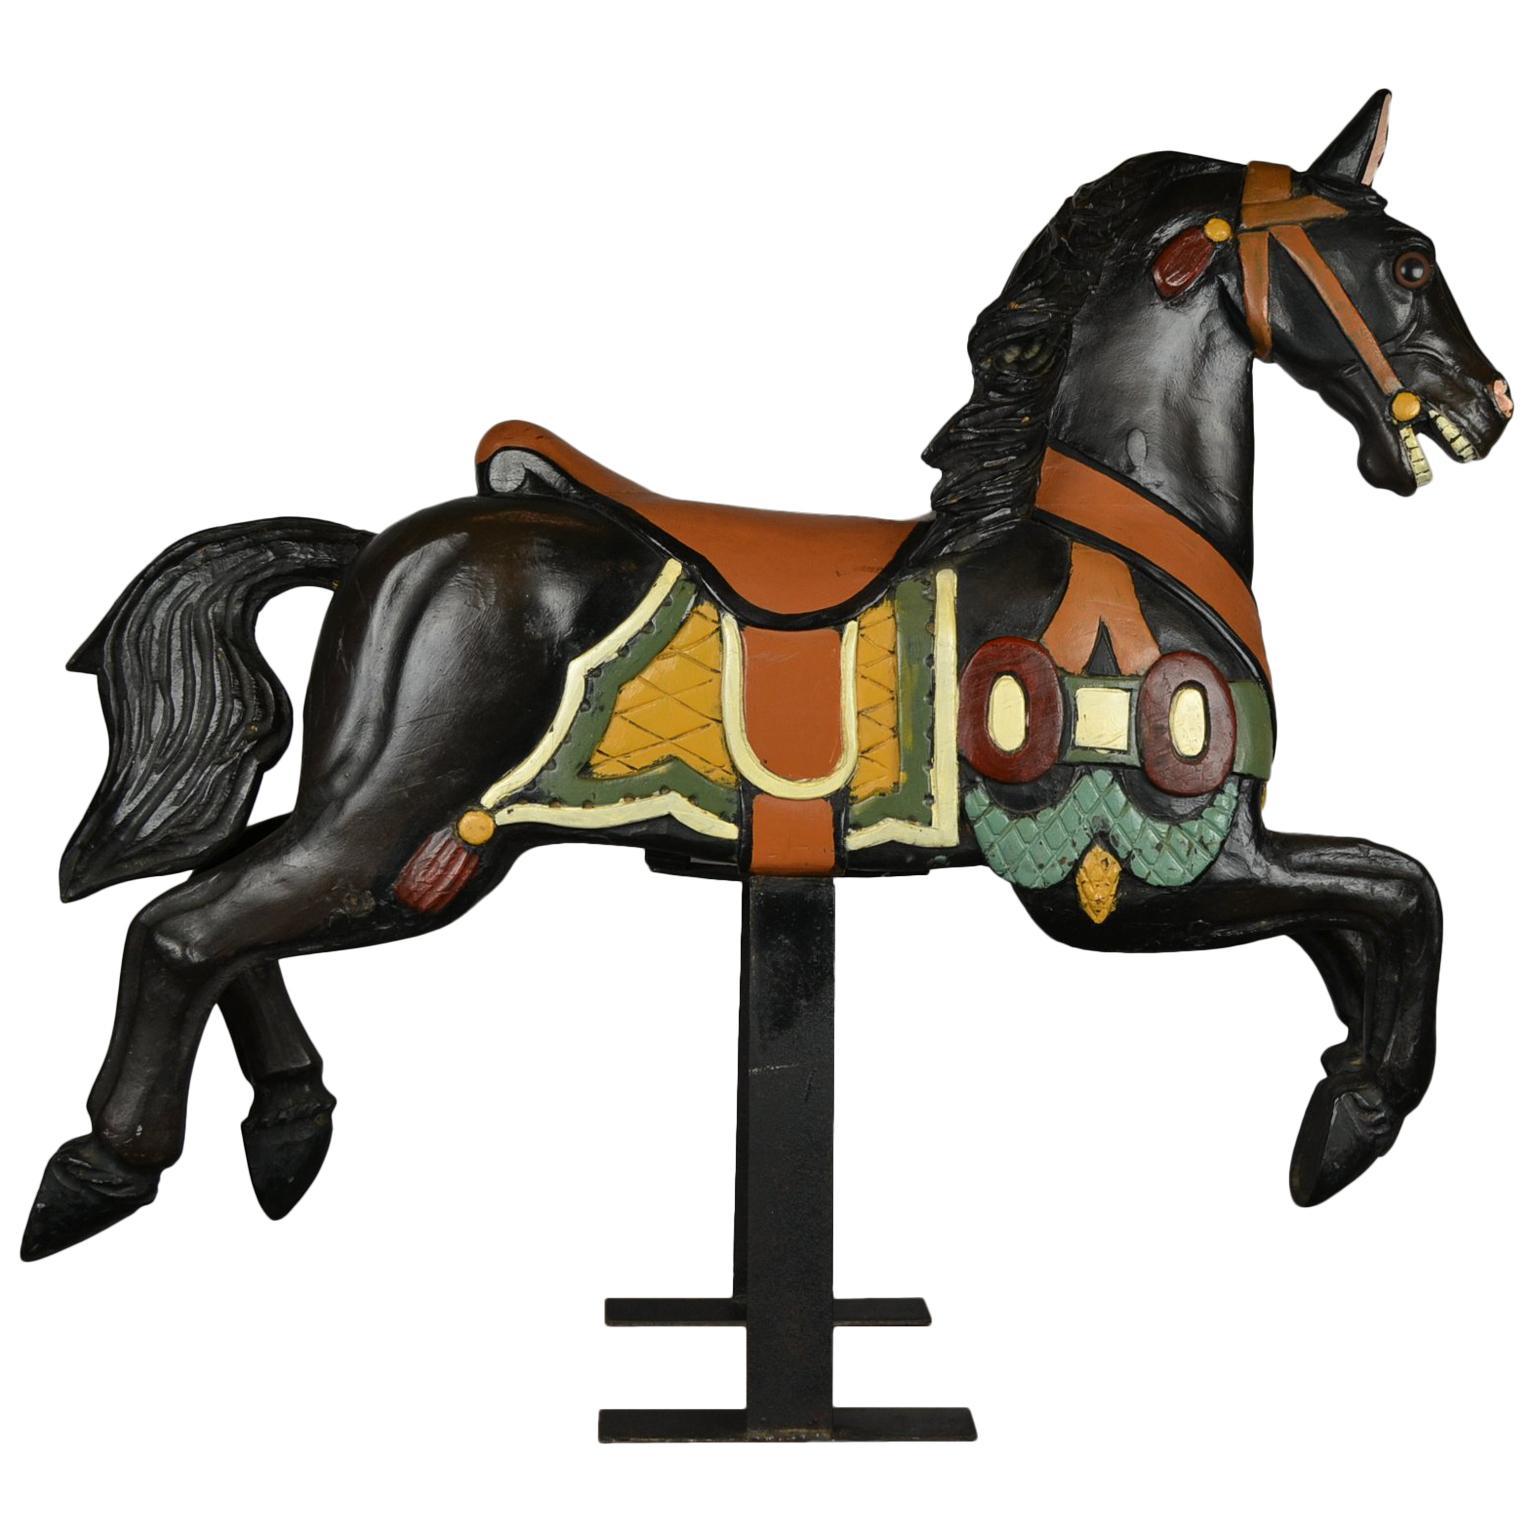 Black Carousel Horse, Wood Horse Sculpture on Metal Base, 1960s